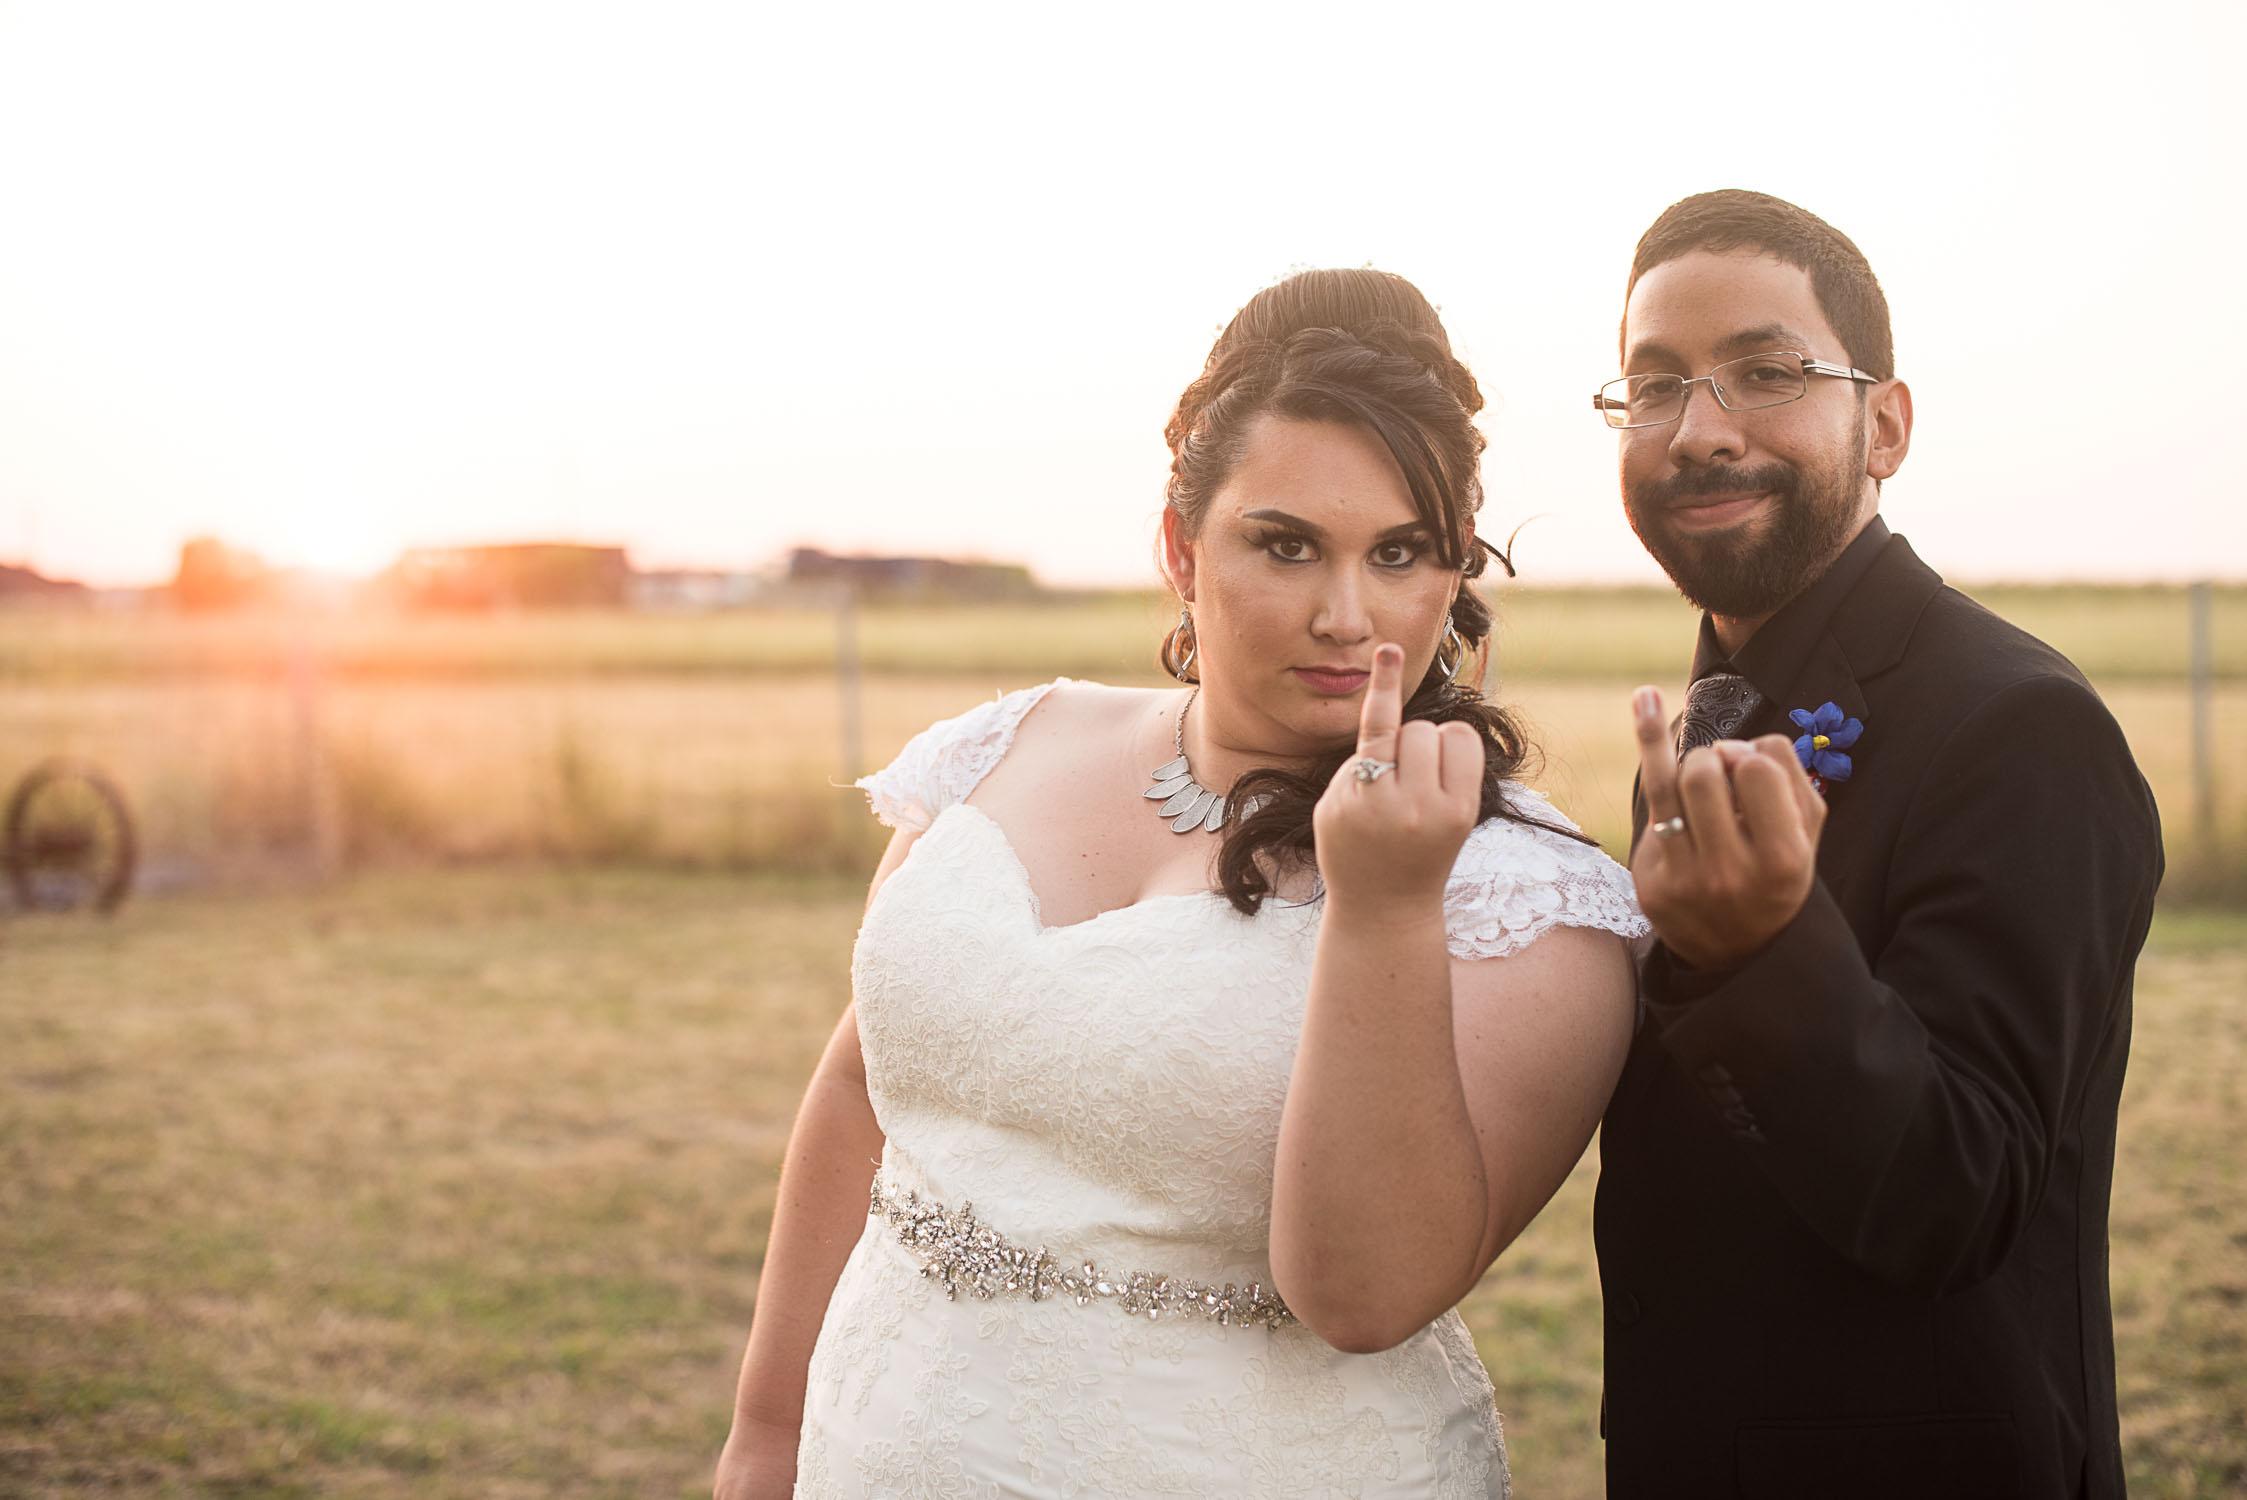 Leal Wedding Mira Visu Photography-141.jpg